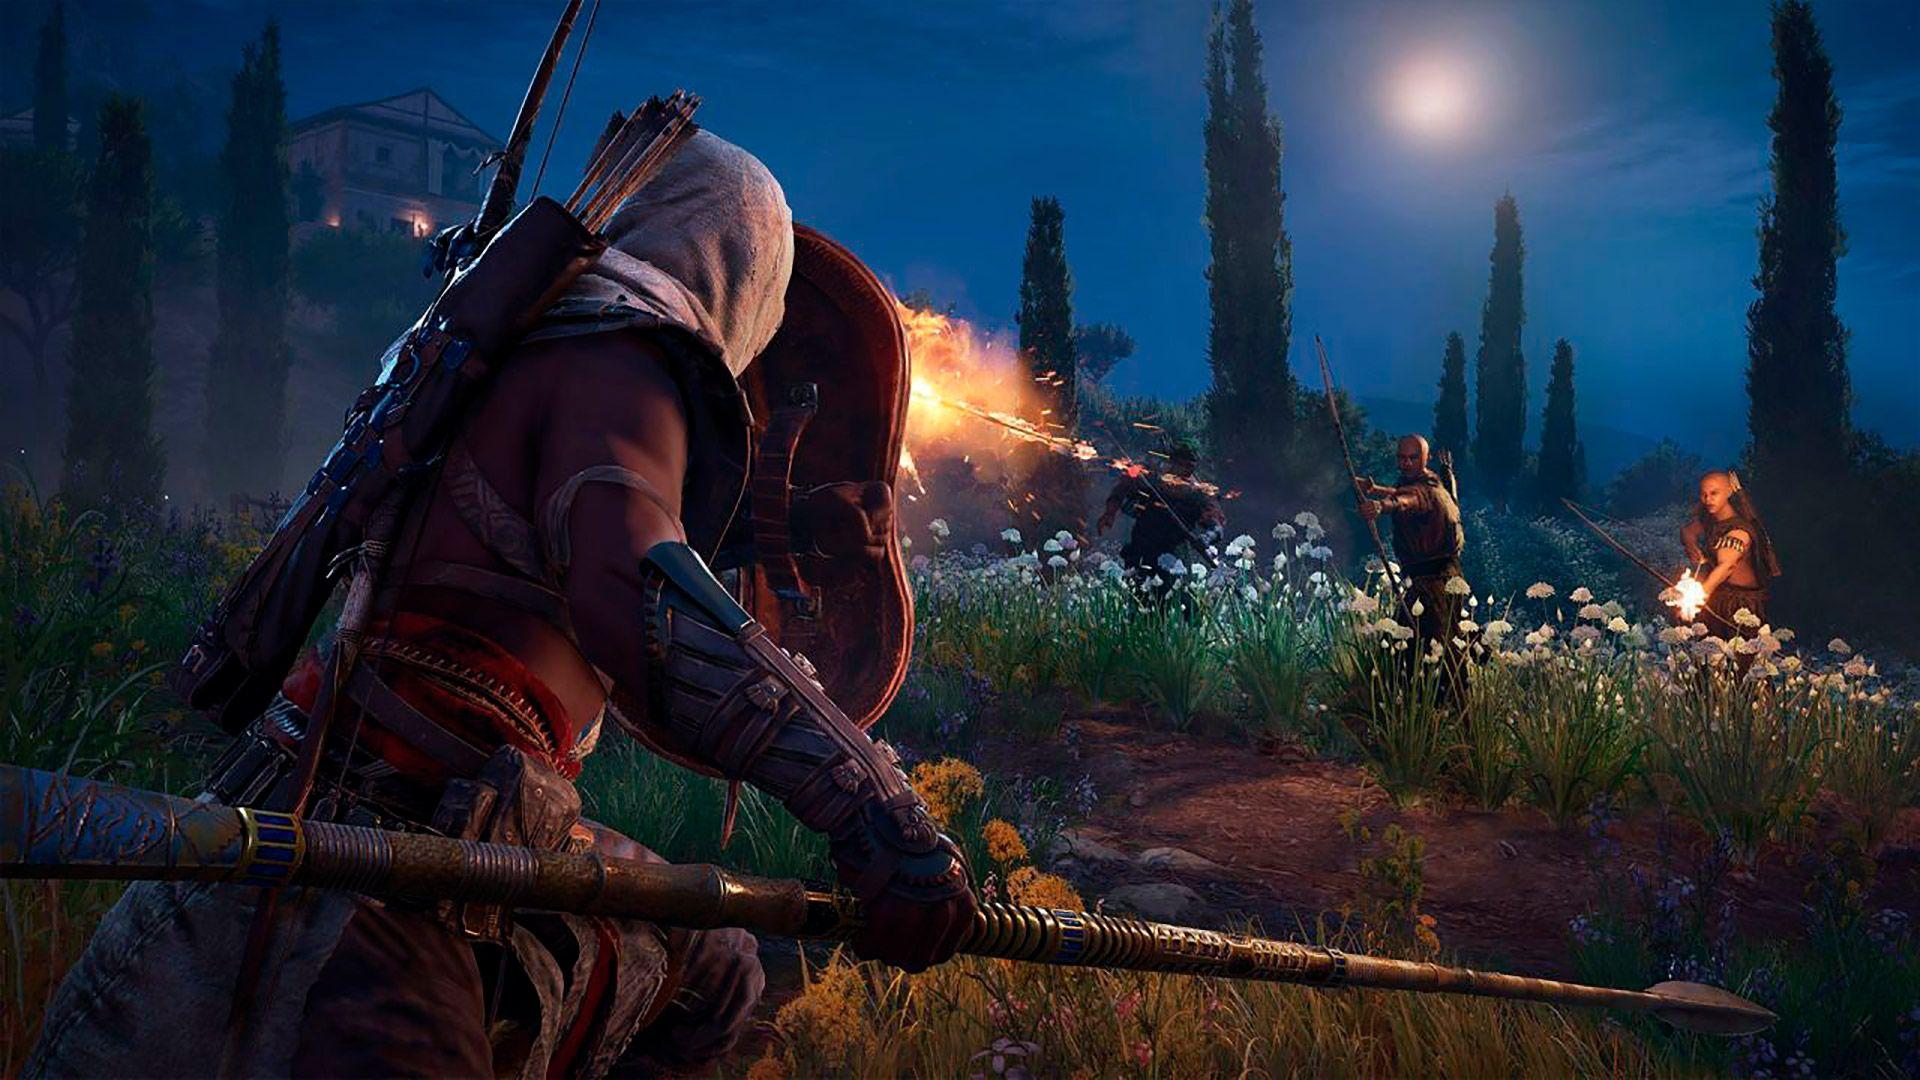 Assassin's Creed Истоки изображение 4